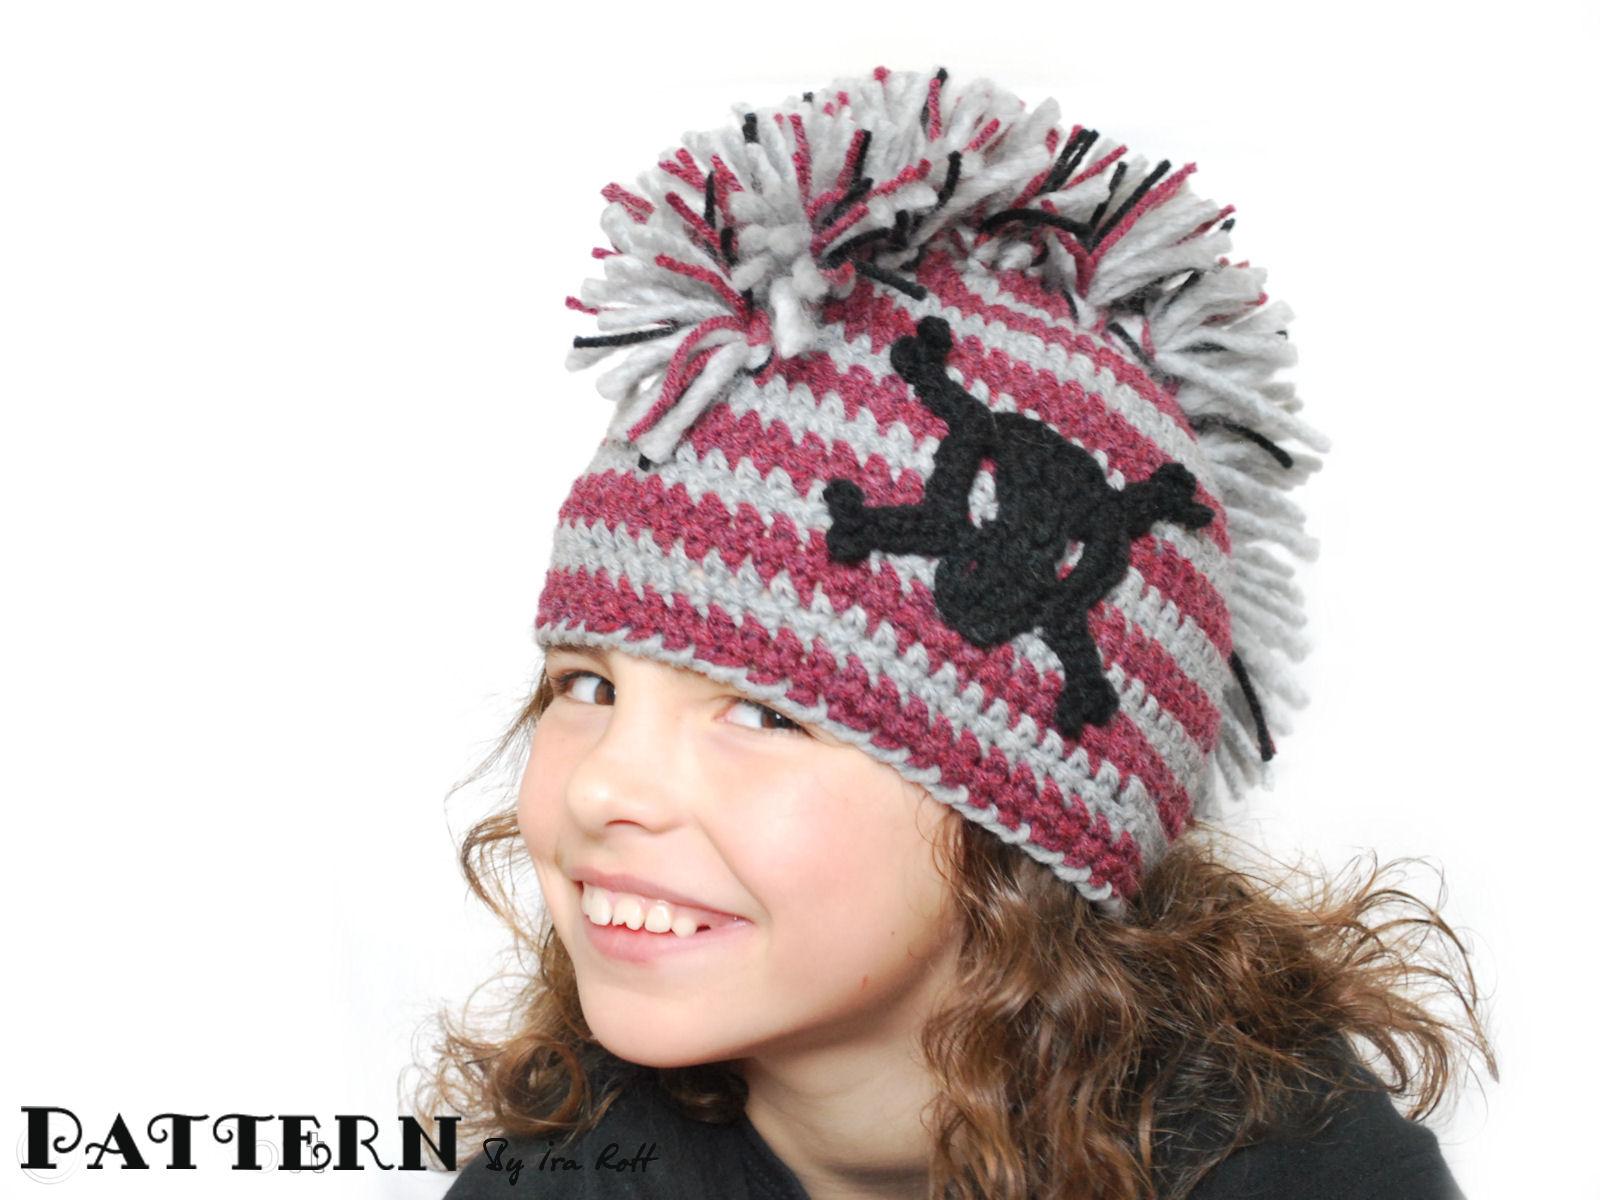 Fashion Crochet Design By Ira Rott Skull And Crossbones Pirate